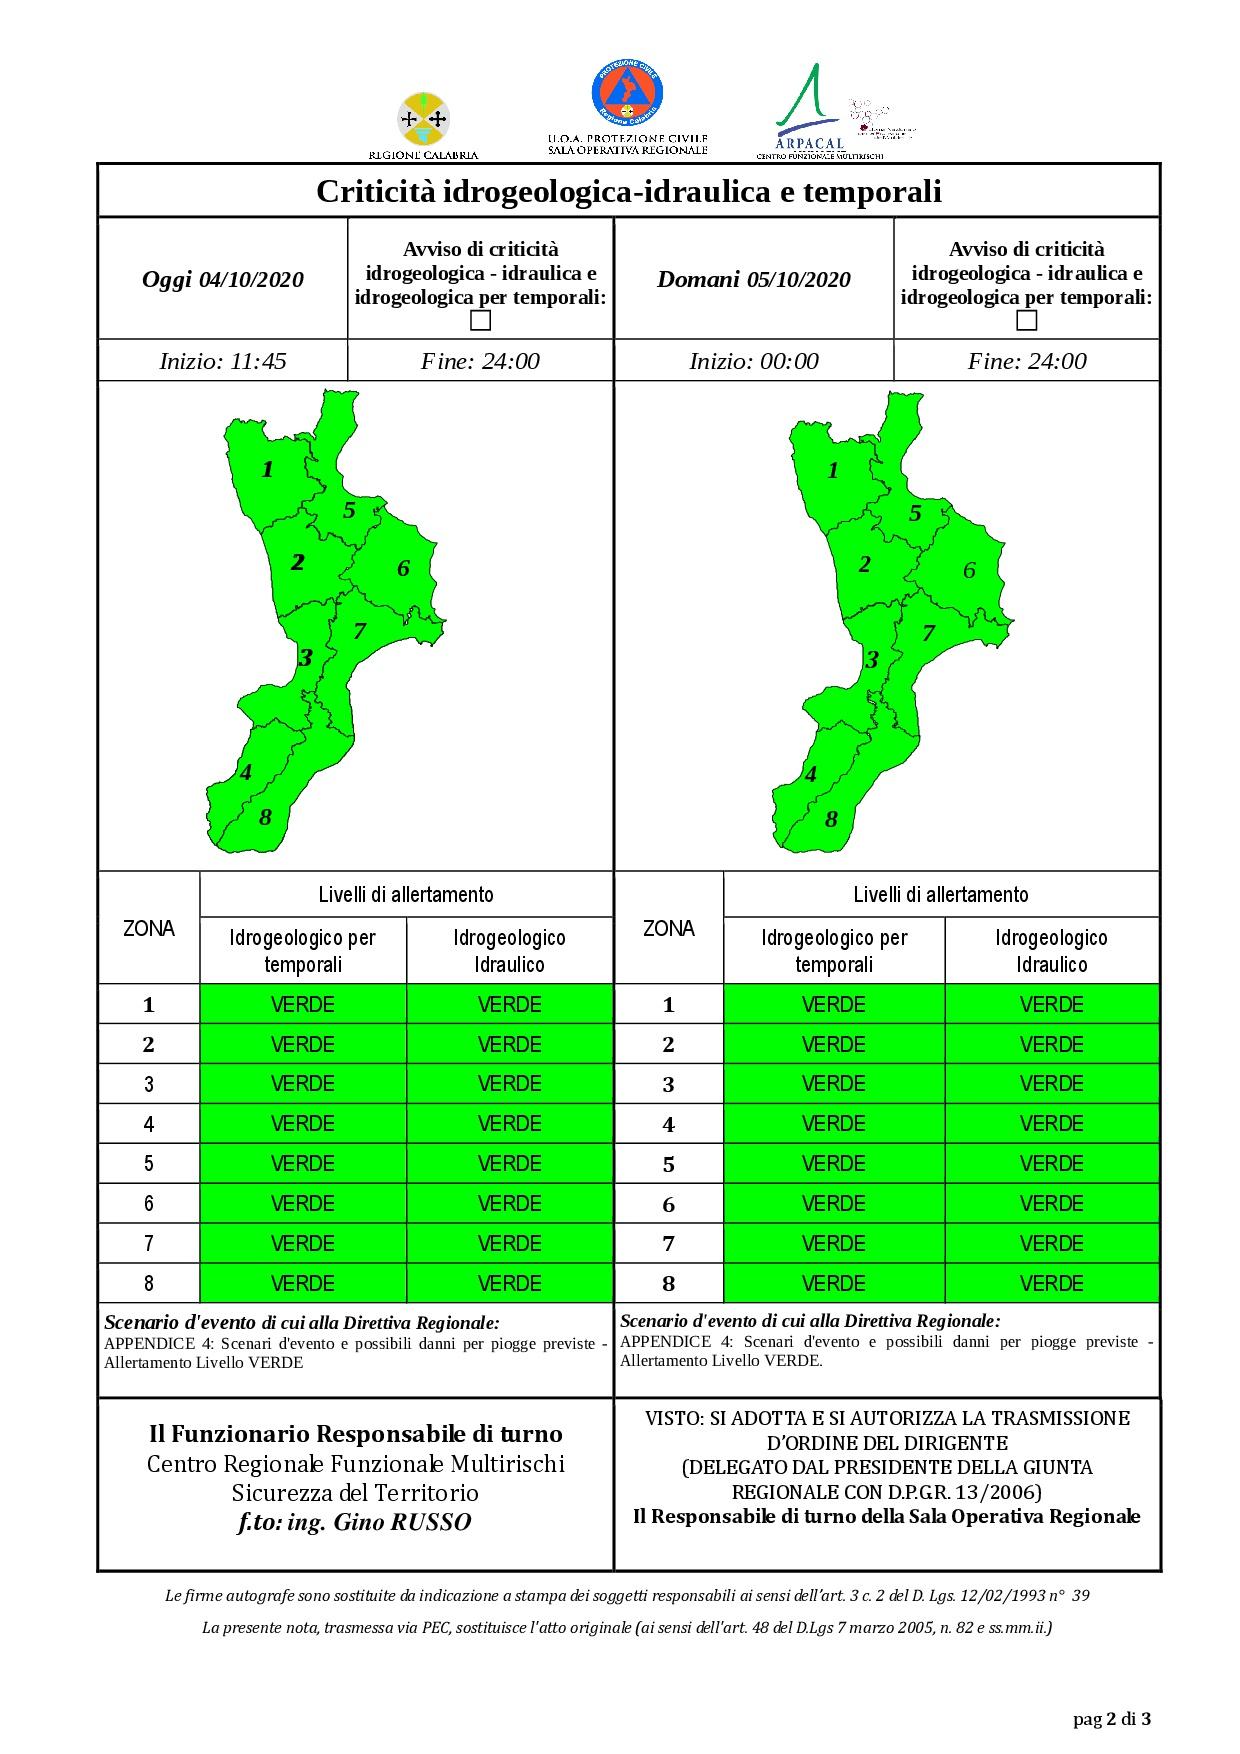 Criticità idrogeologica-idraulica e temporali in Calabria 04-10-2020